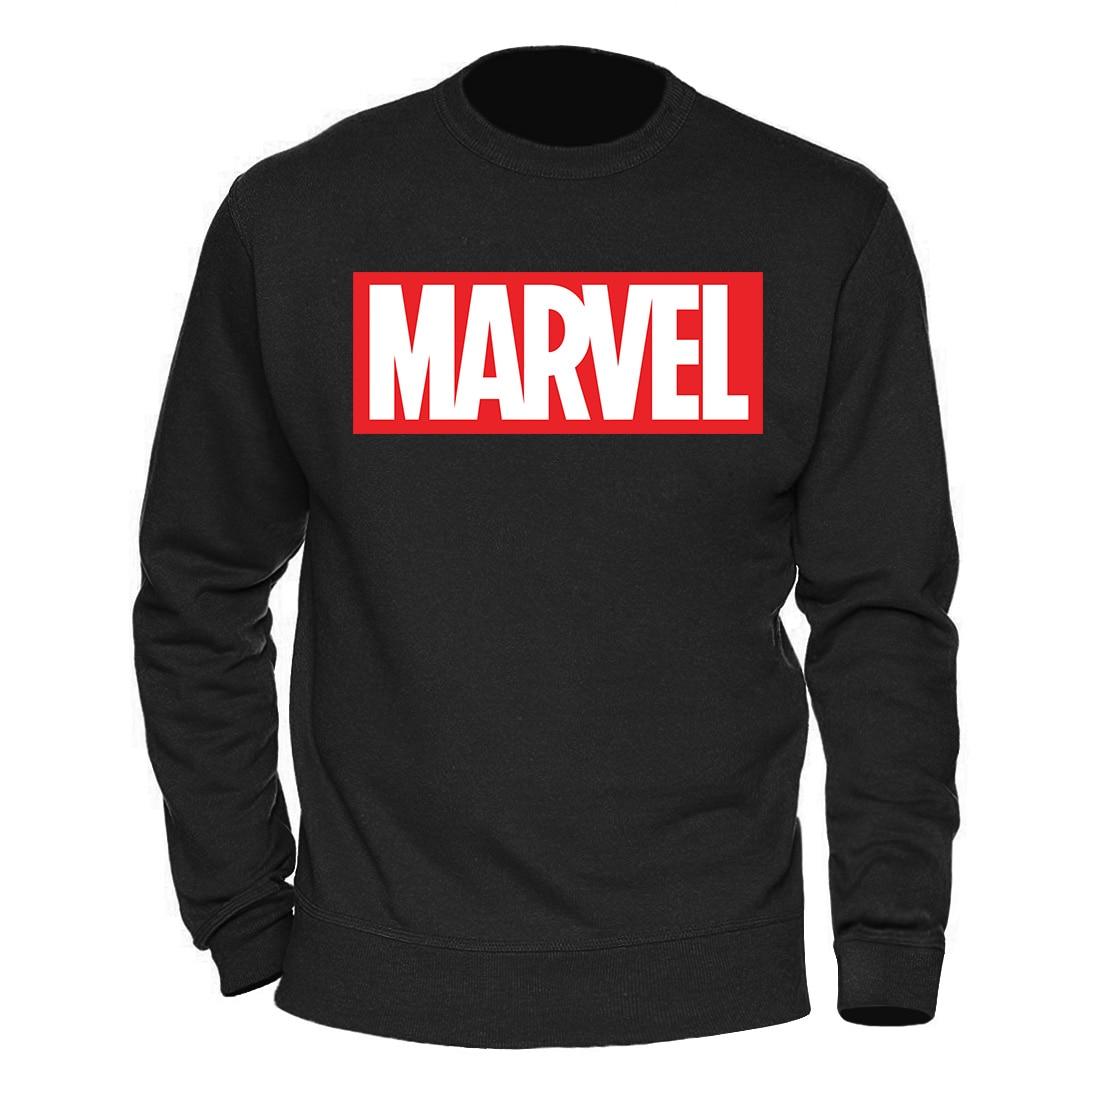 2020 Hot Newest Super Hero Marvel Sweatshirts Fashion Suprem Men Marvel Cool Printed Sweatshirts Streetwear Men Clothing